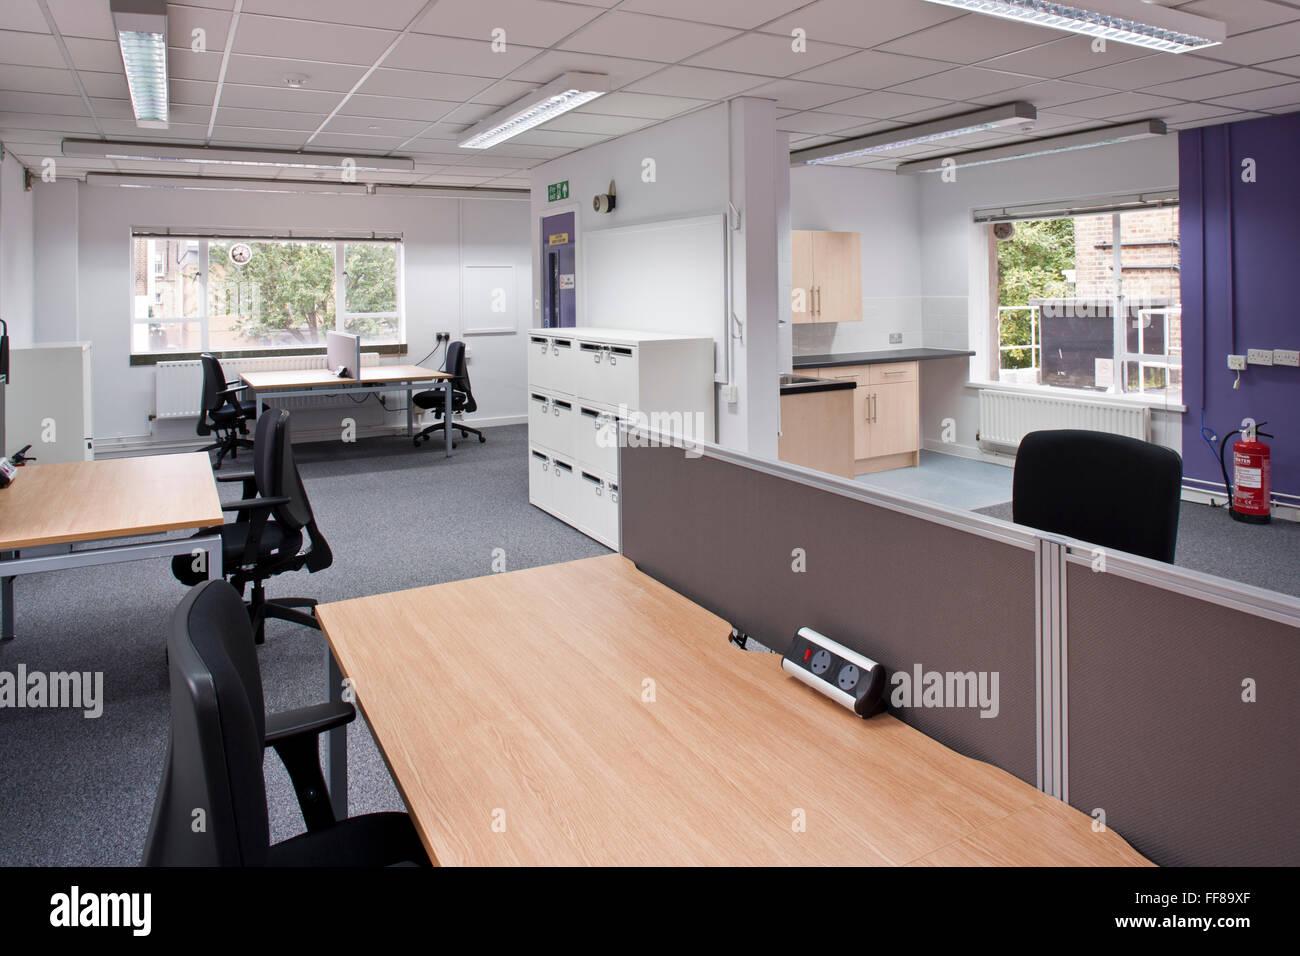 open plan office - Stock Image